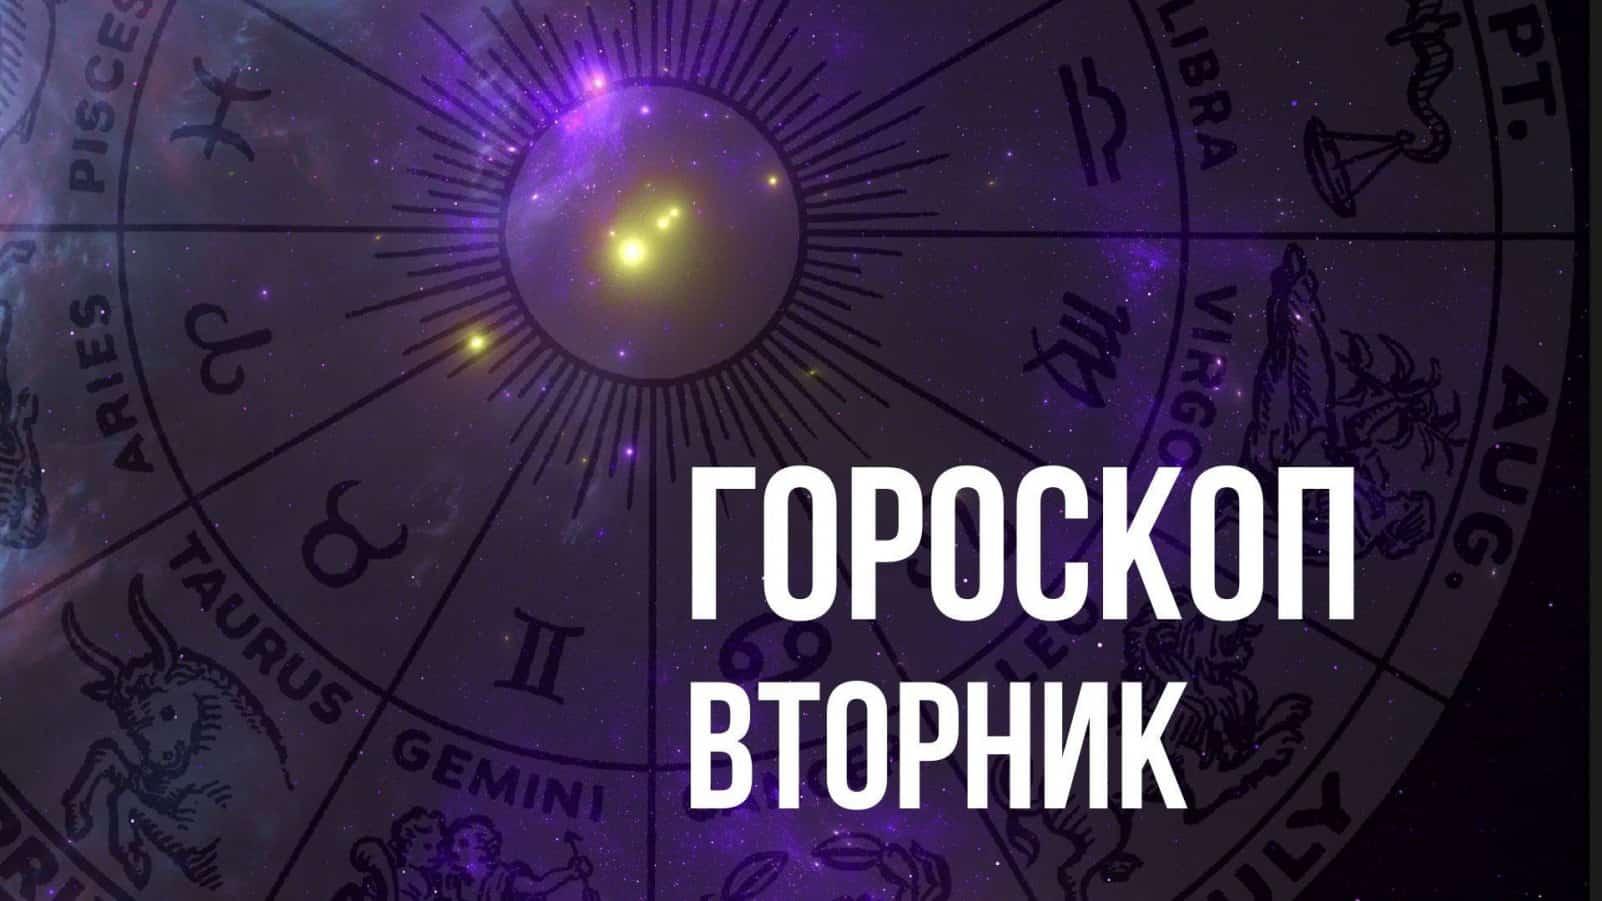 Гороскоп на вторник 15 июня для каждого знака Зодиака